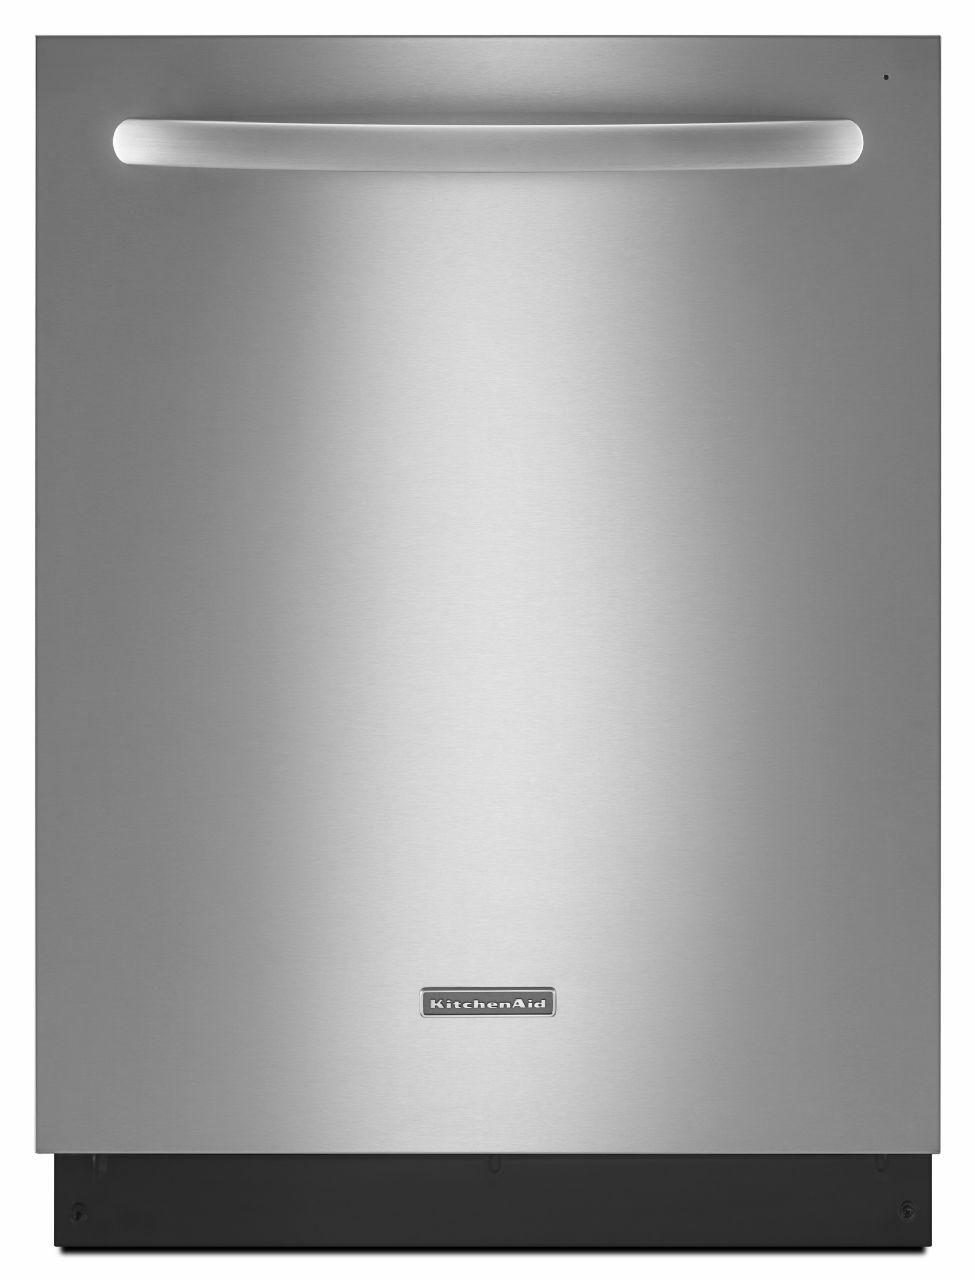 KitchenAid Dishwasher Model KUDS35FXSS5 Parts